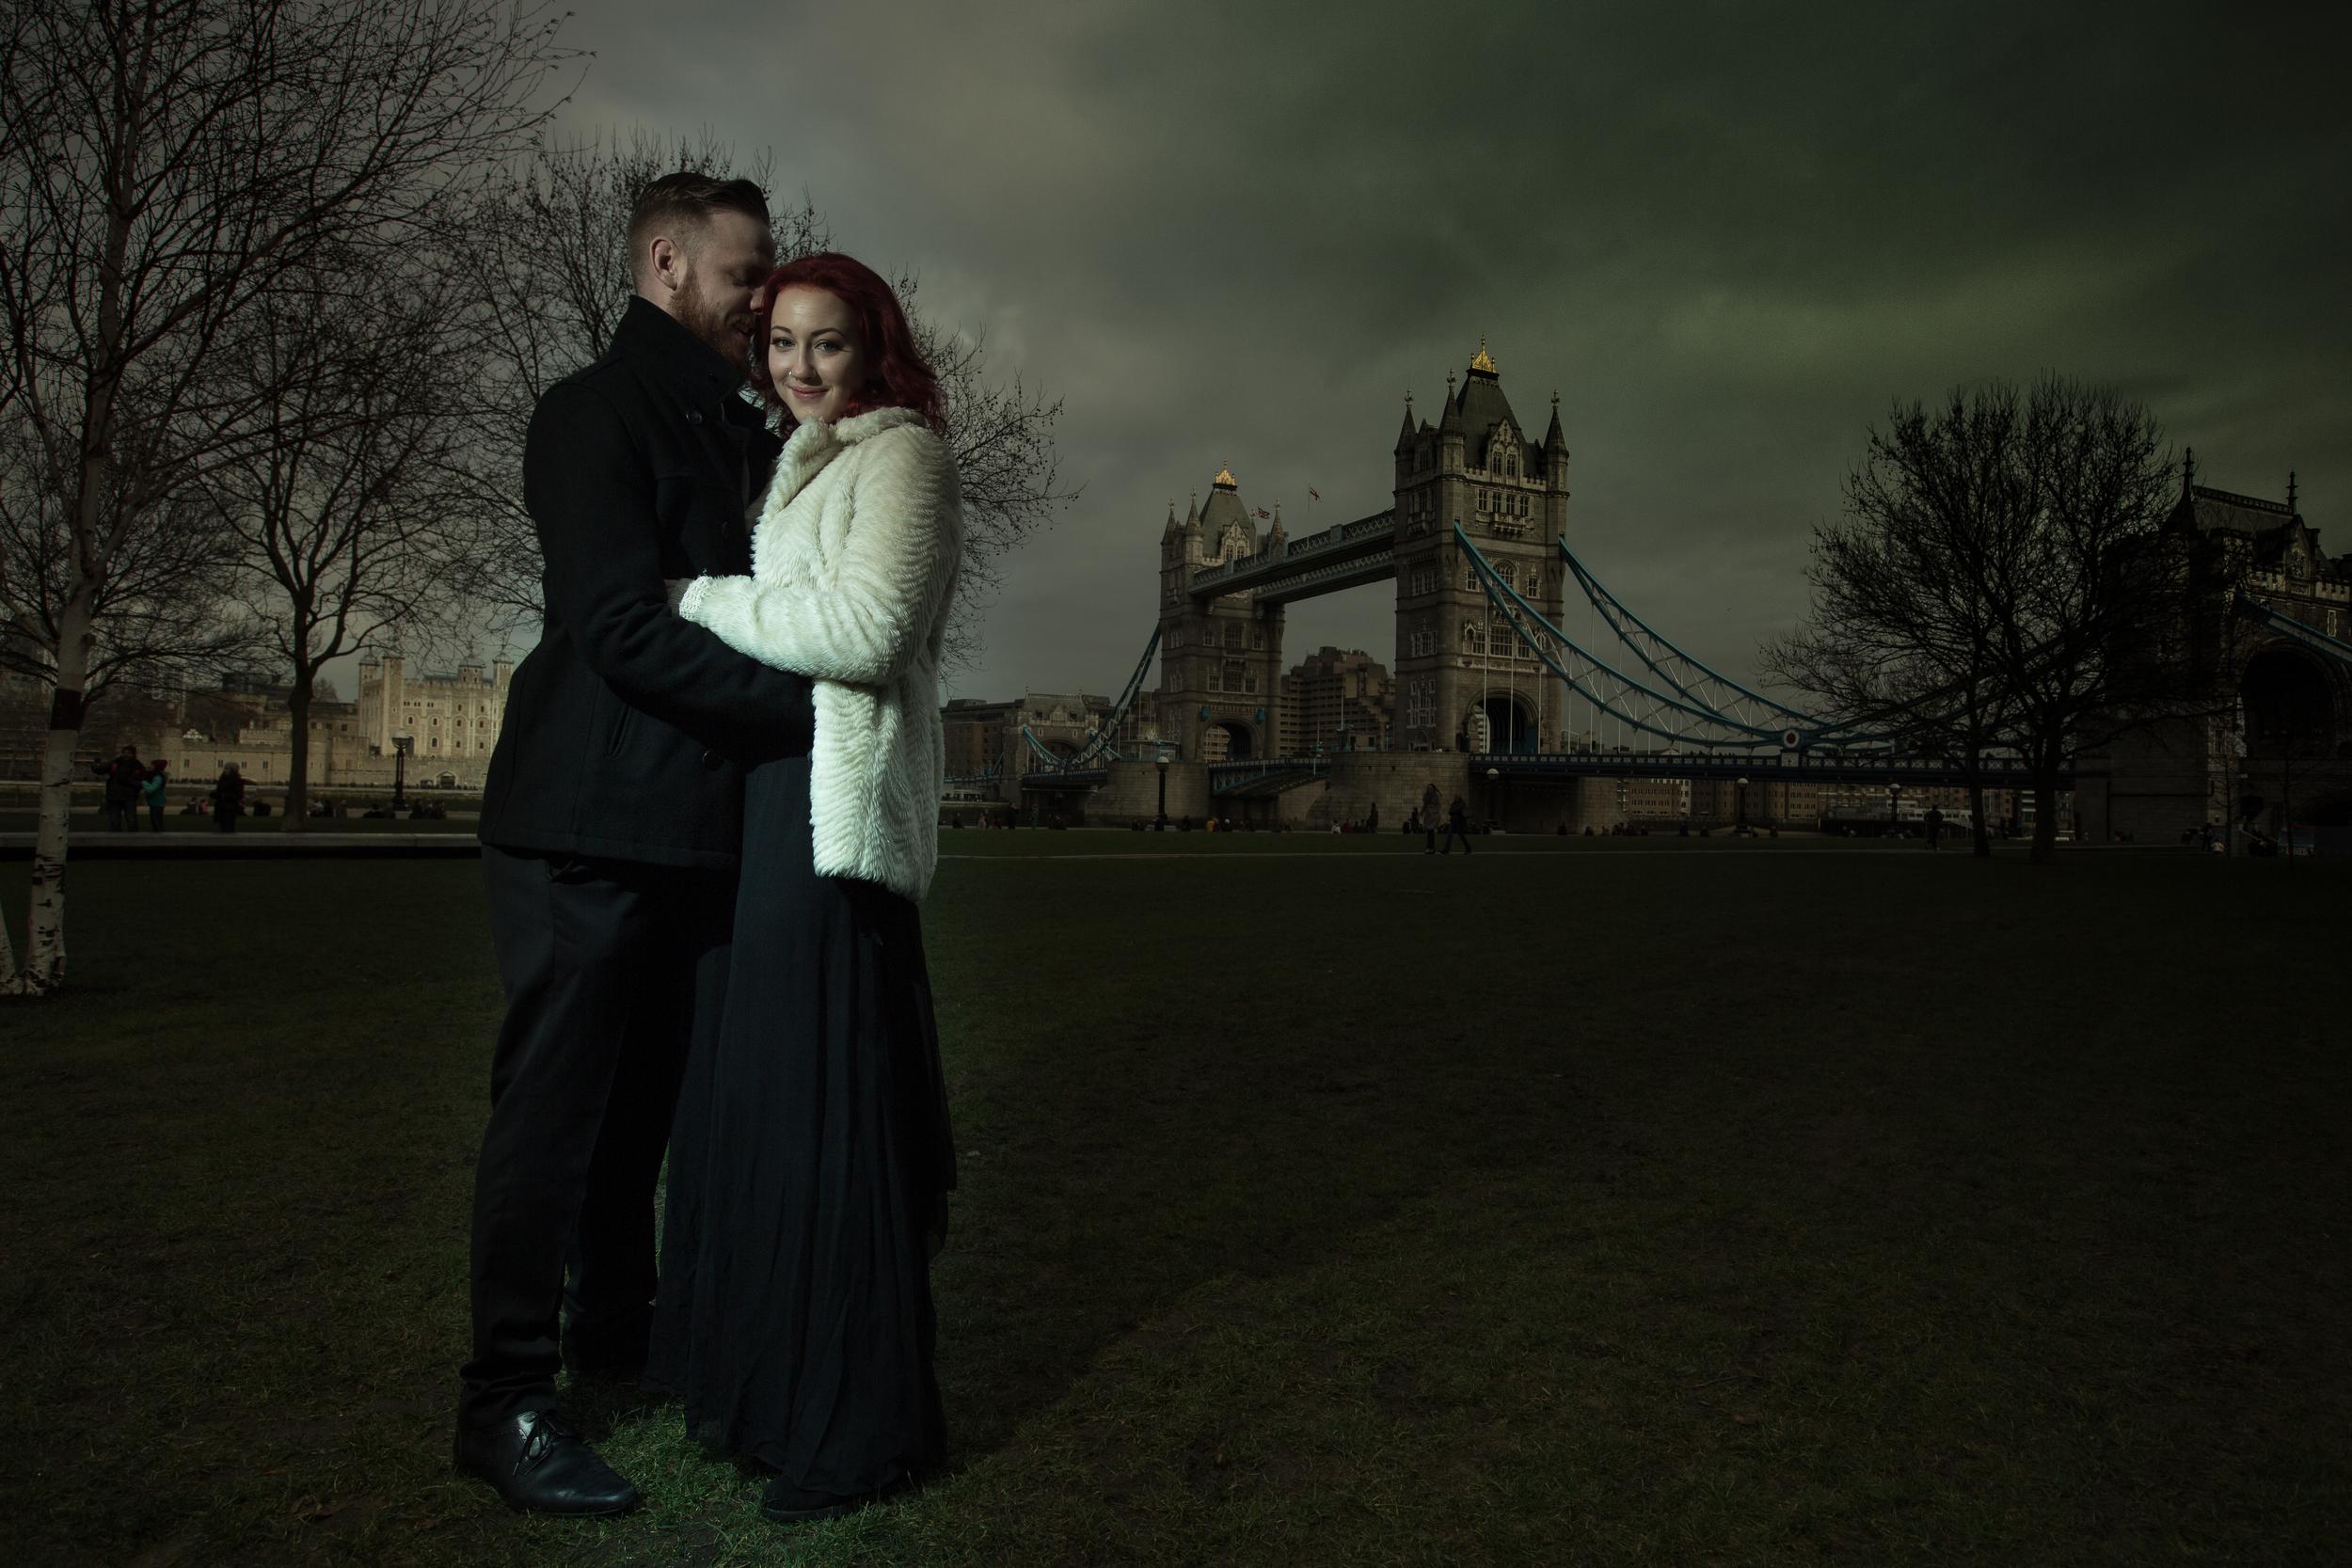 westminster-engagement-adam-rowley-wedding-photography-london-tower-bridge